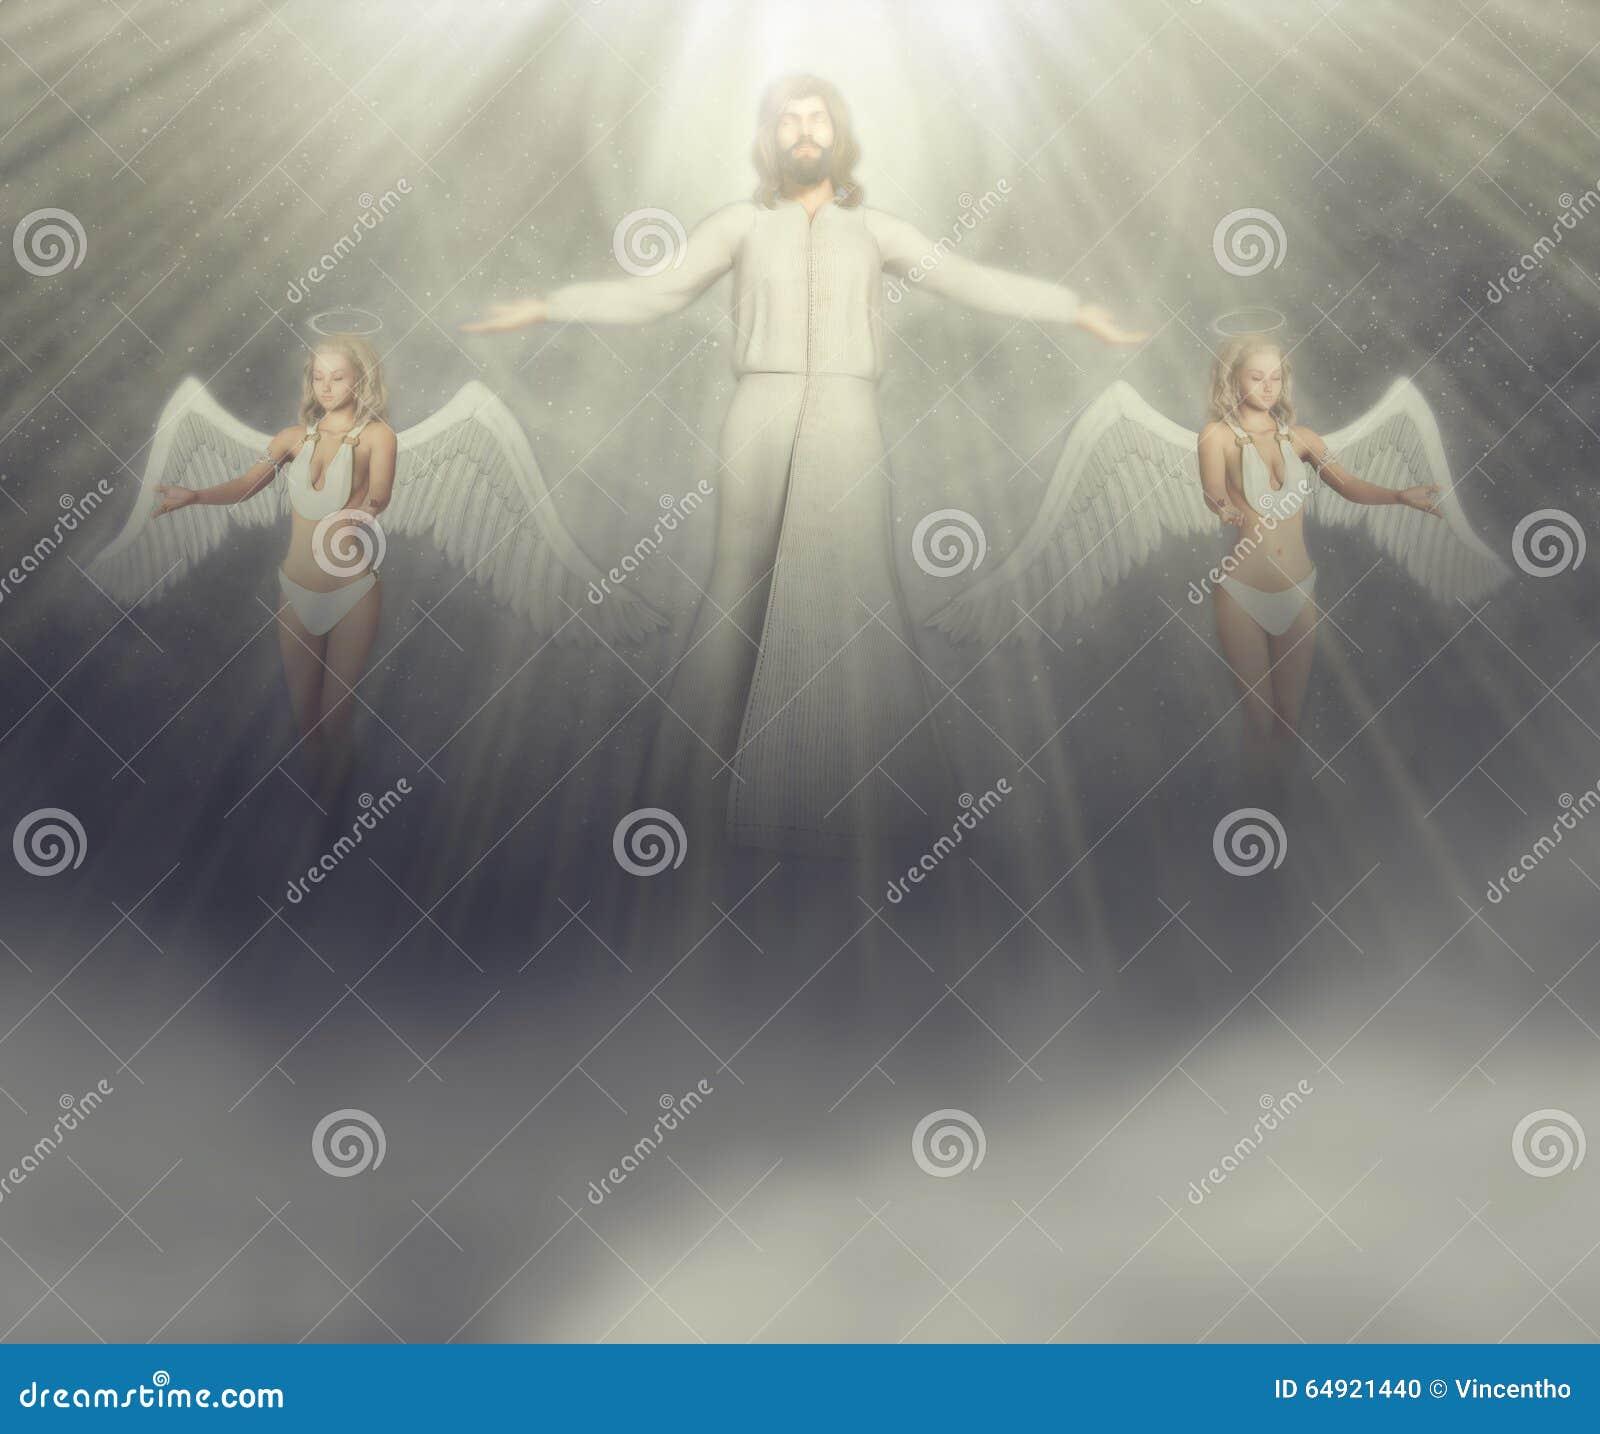 Jesus Christ Second Coming Stock Illustrations – 8 Jesus Christ ...